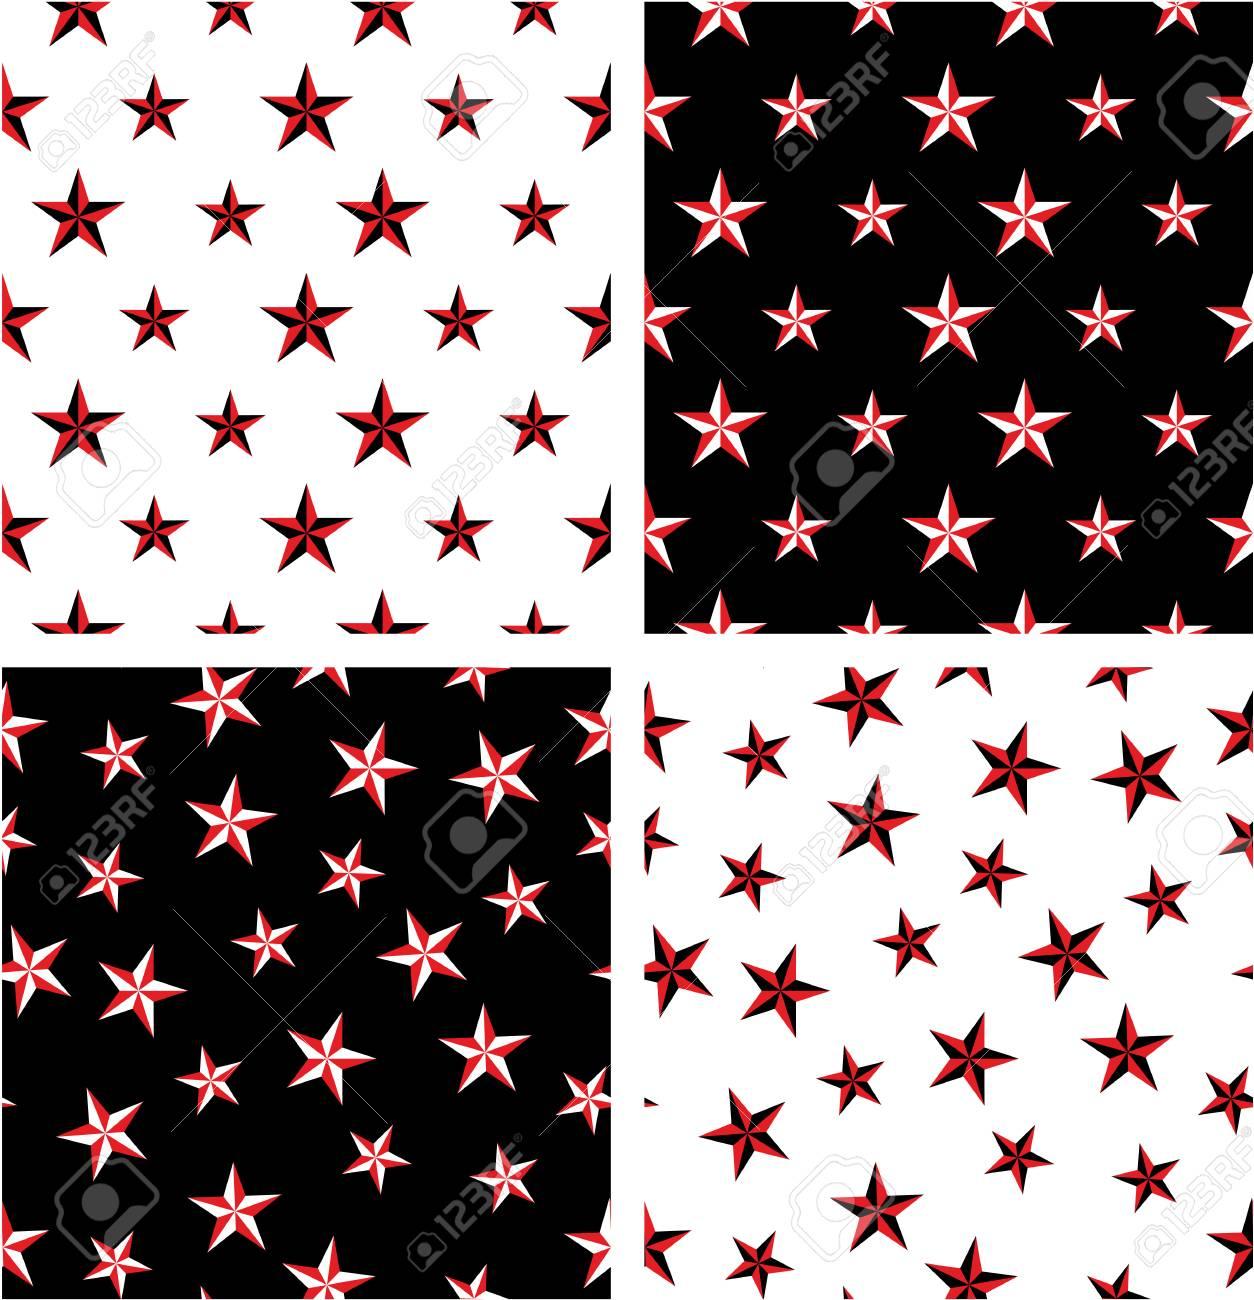 Red Black Color Nautical Star Big Small Aligned Random